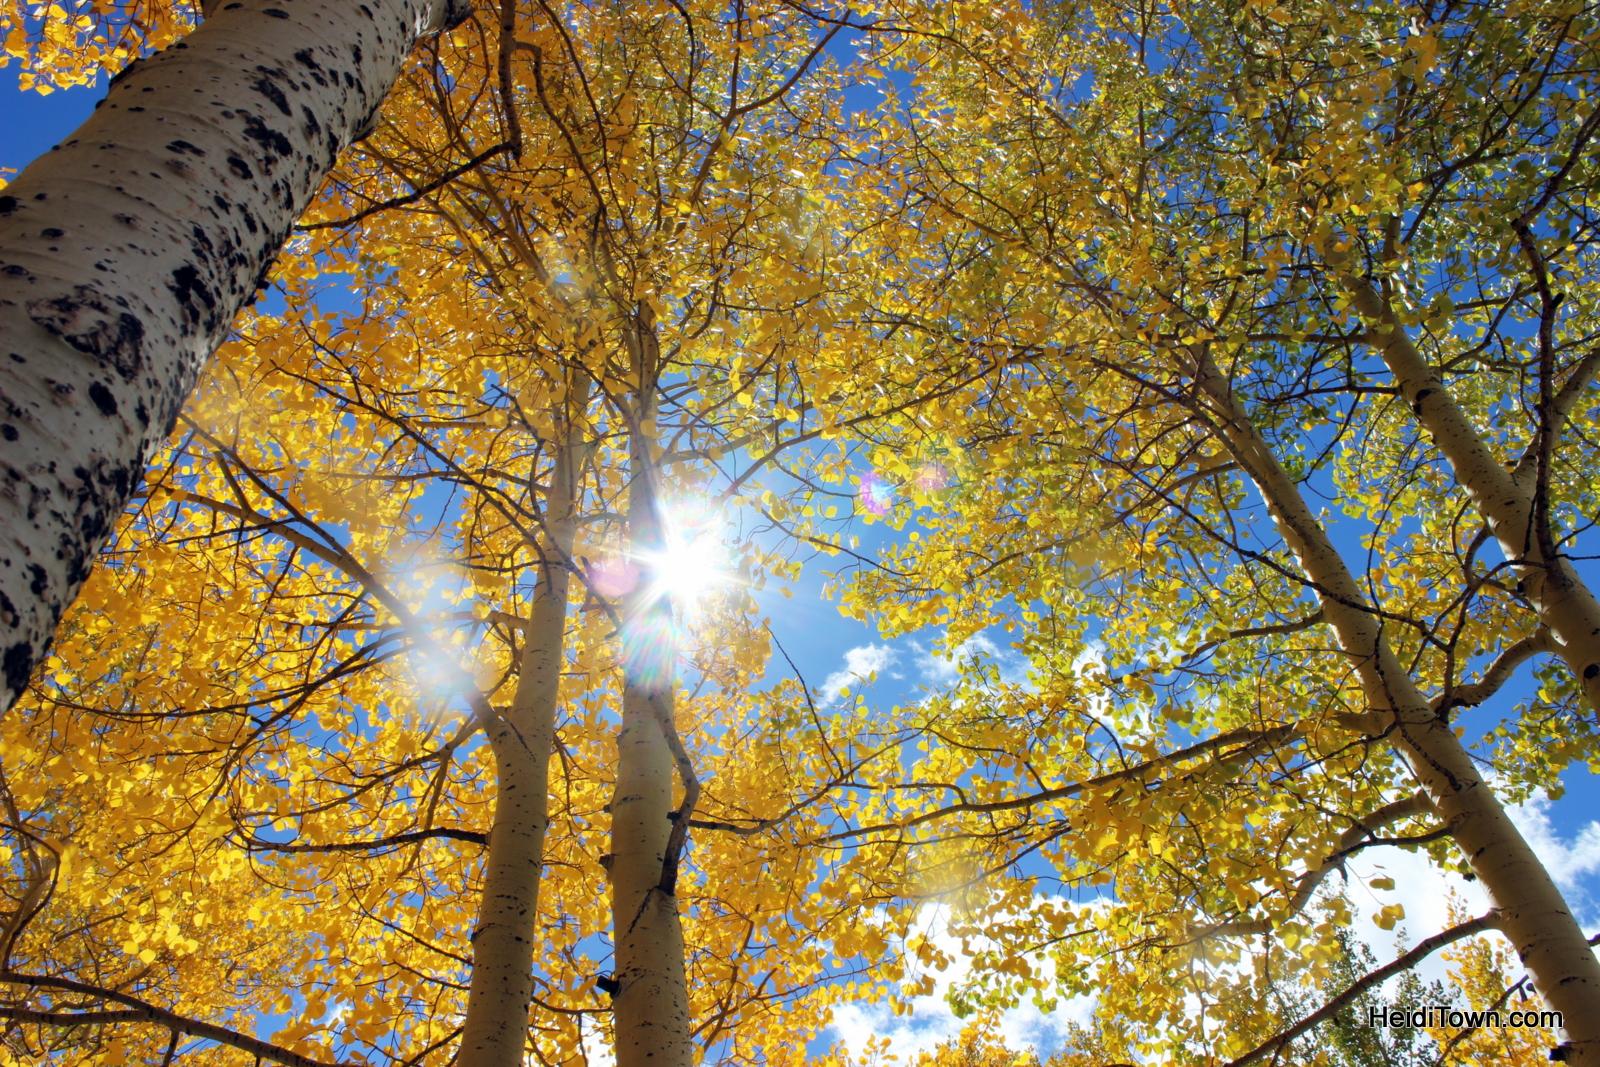 Colorado sunshine on my shoulders make me happy. HeidiTown.com